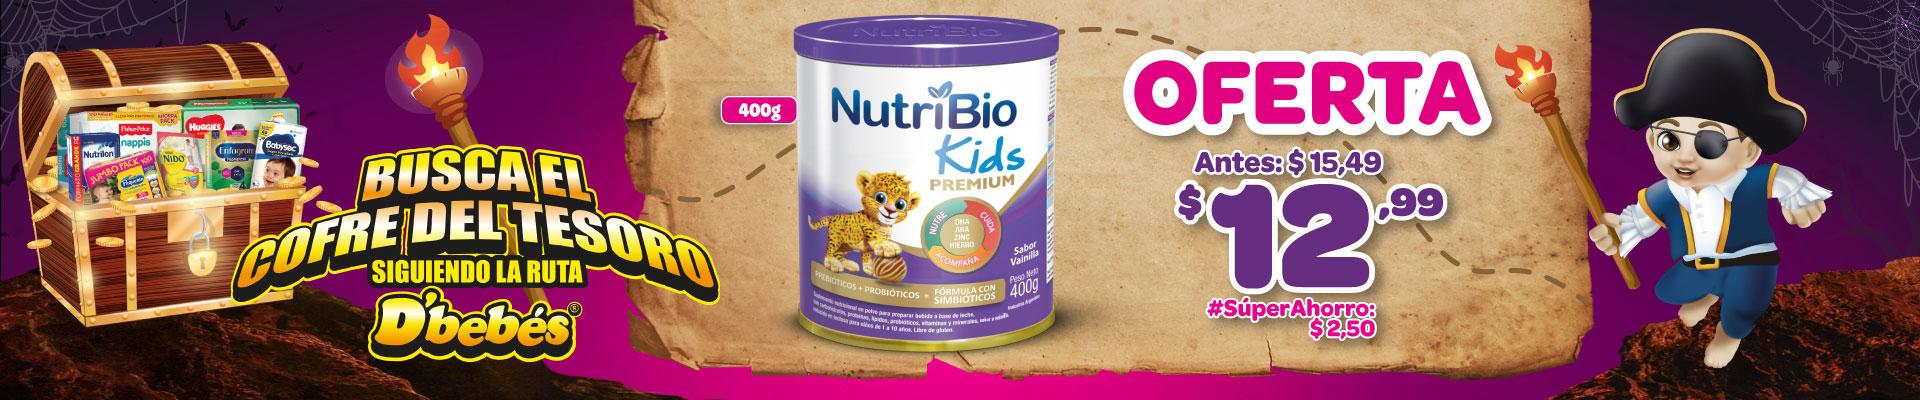 BANNER NUTRIBIO KIDS 400 GR